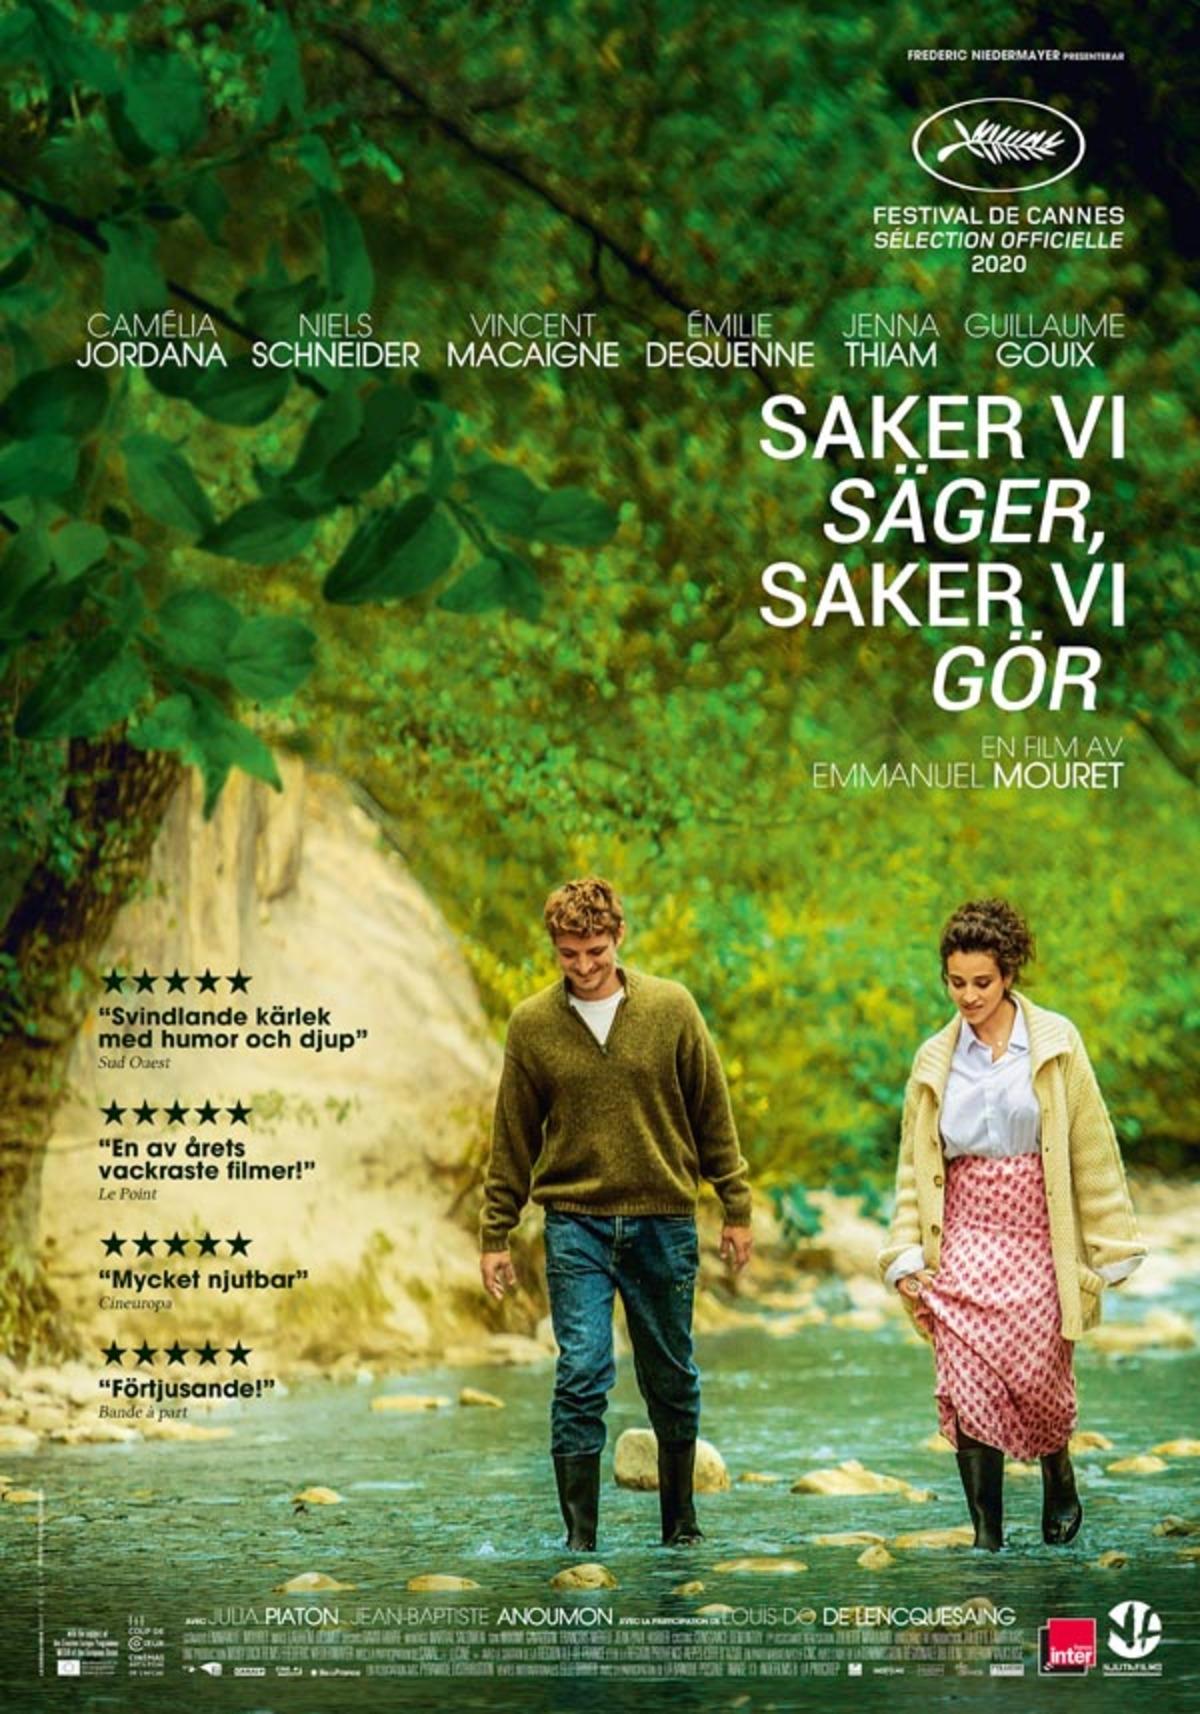 large_bd961760ed3e98a6df53b4ac896bc884-sakervisager_poster